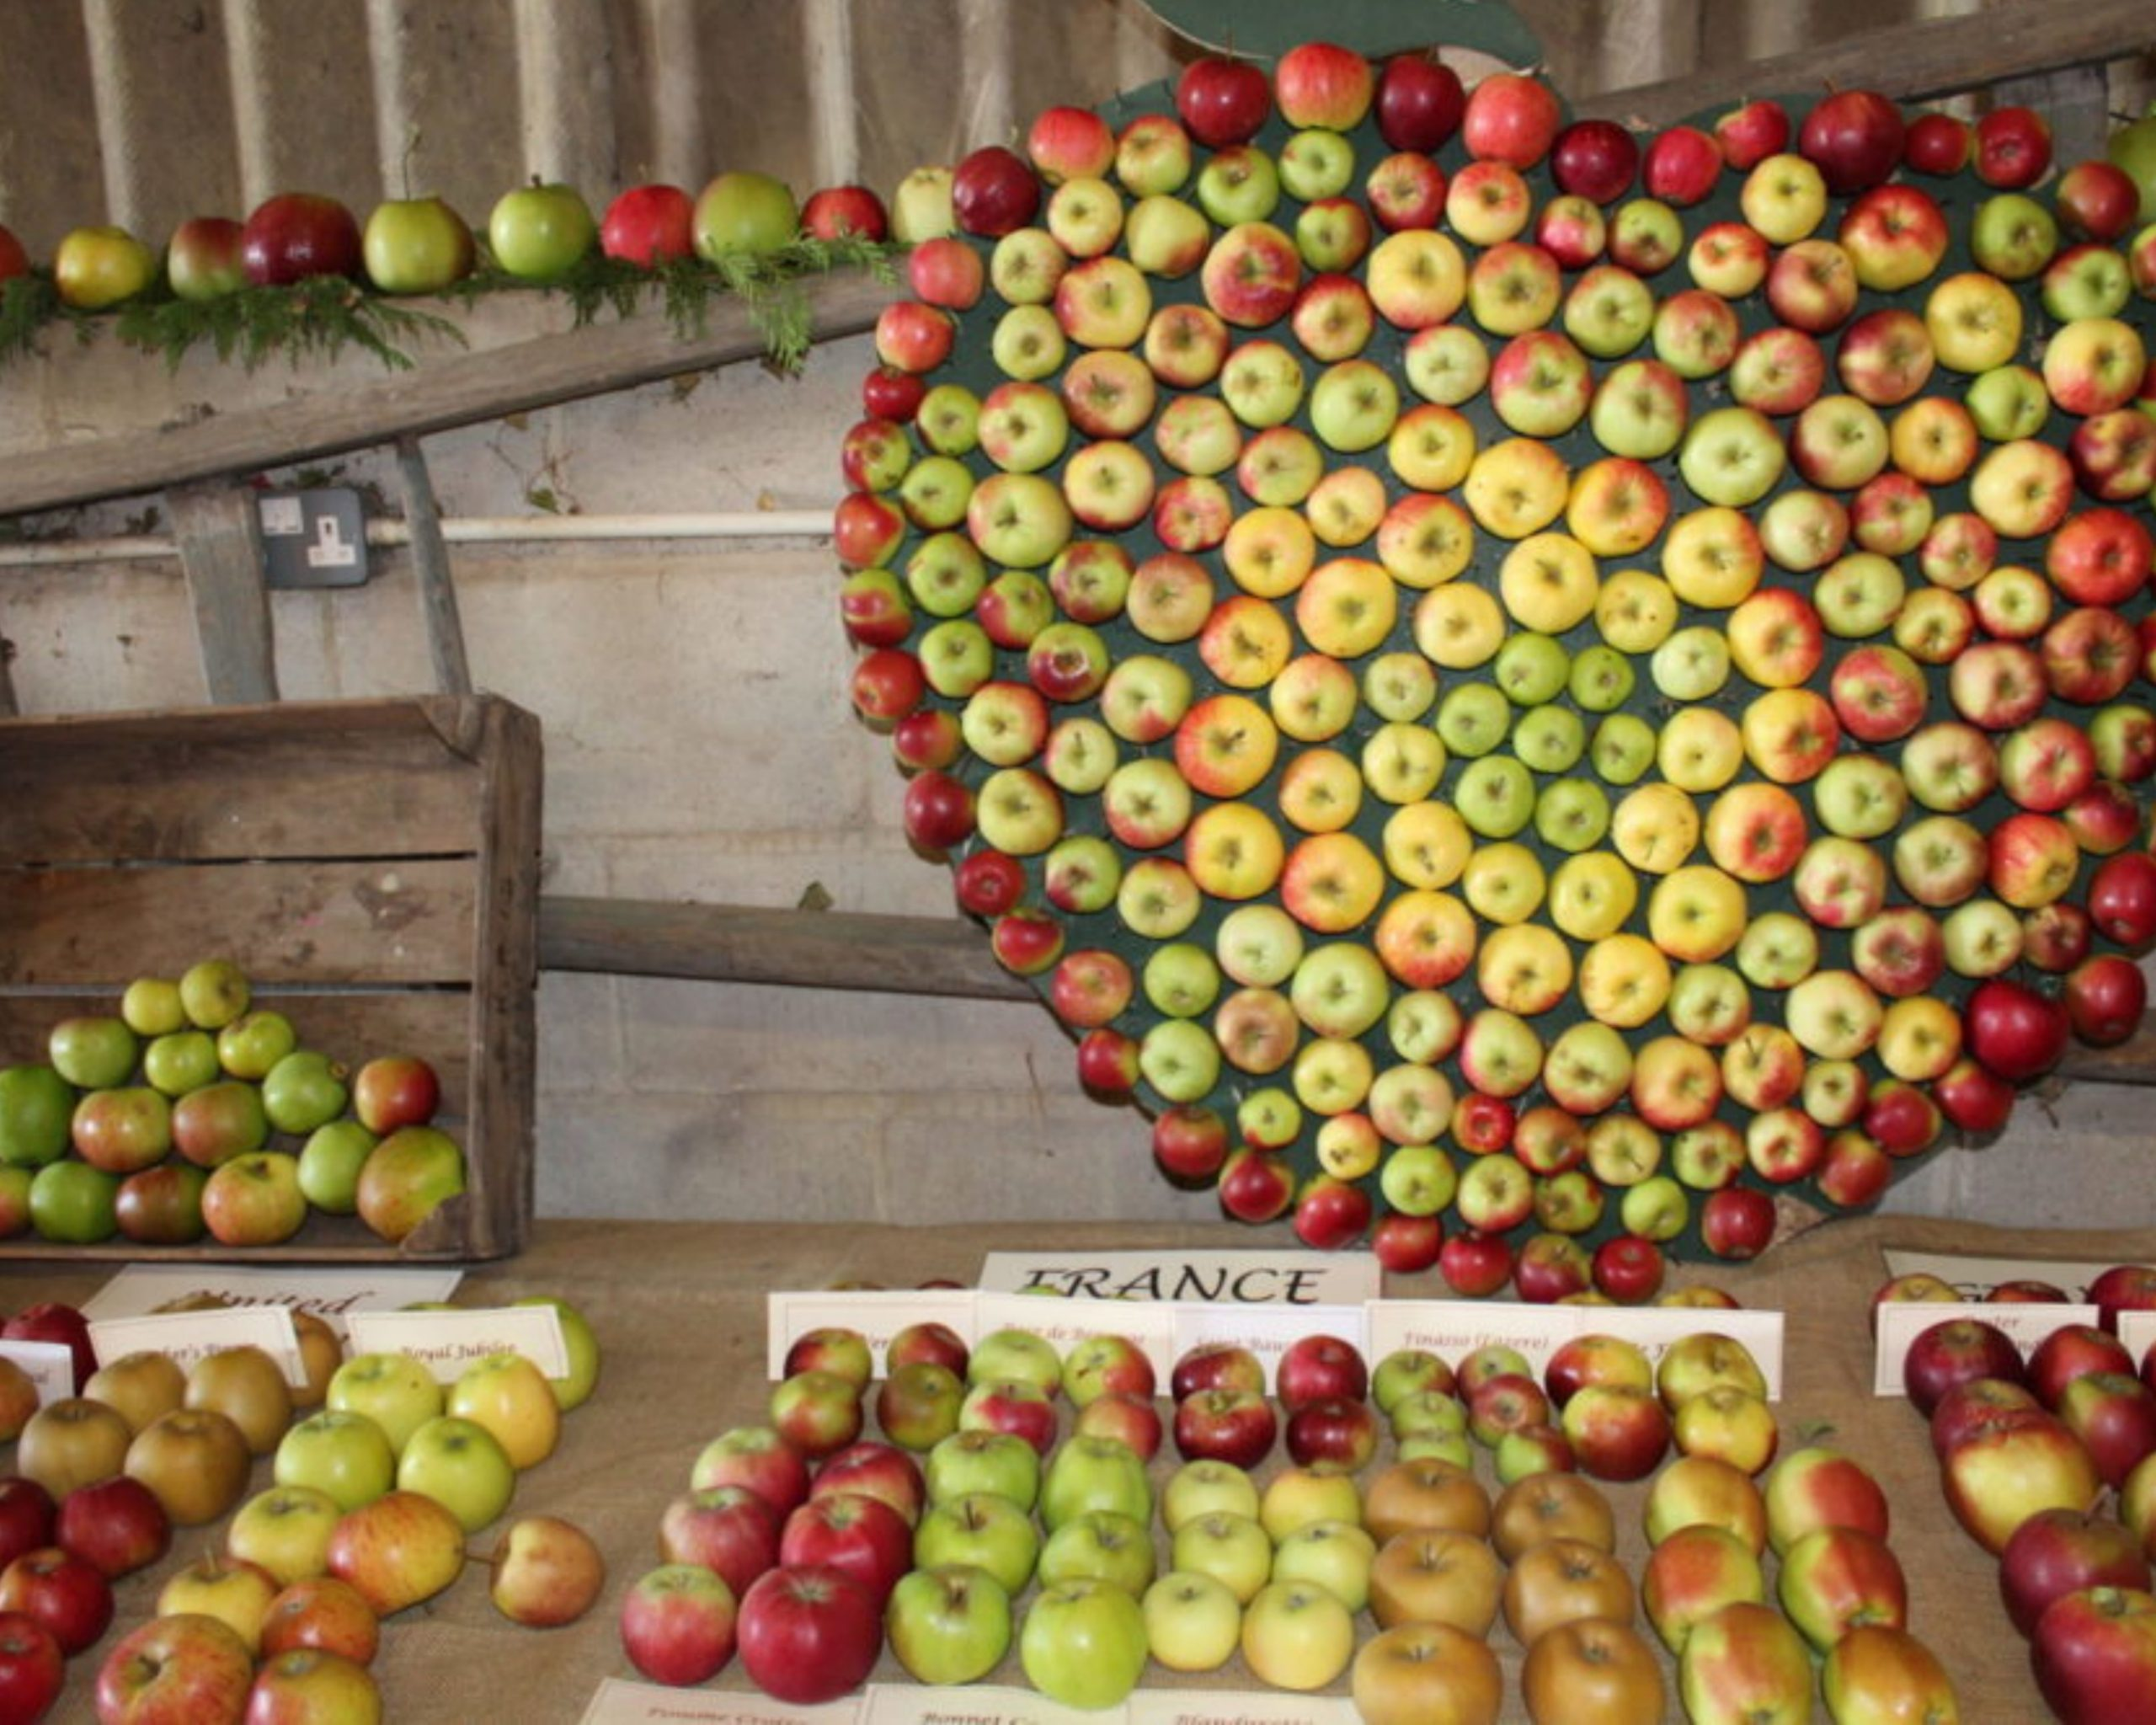 Lots of apples in a pretty shape